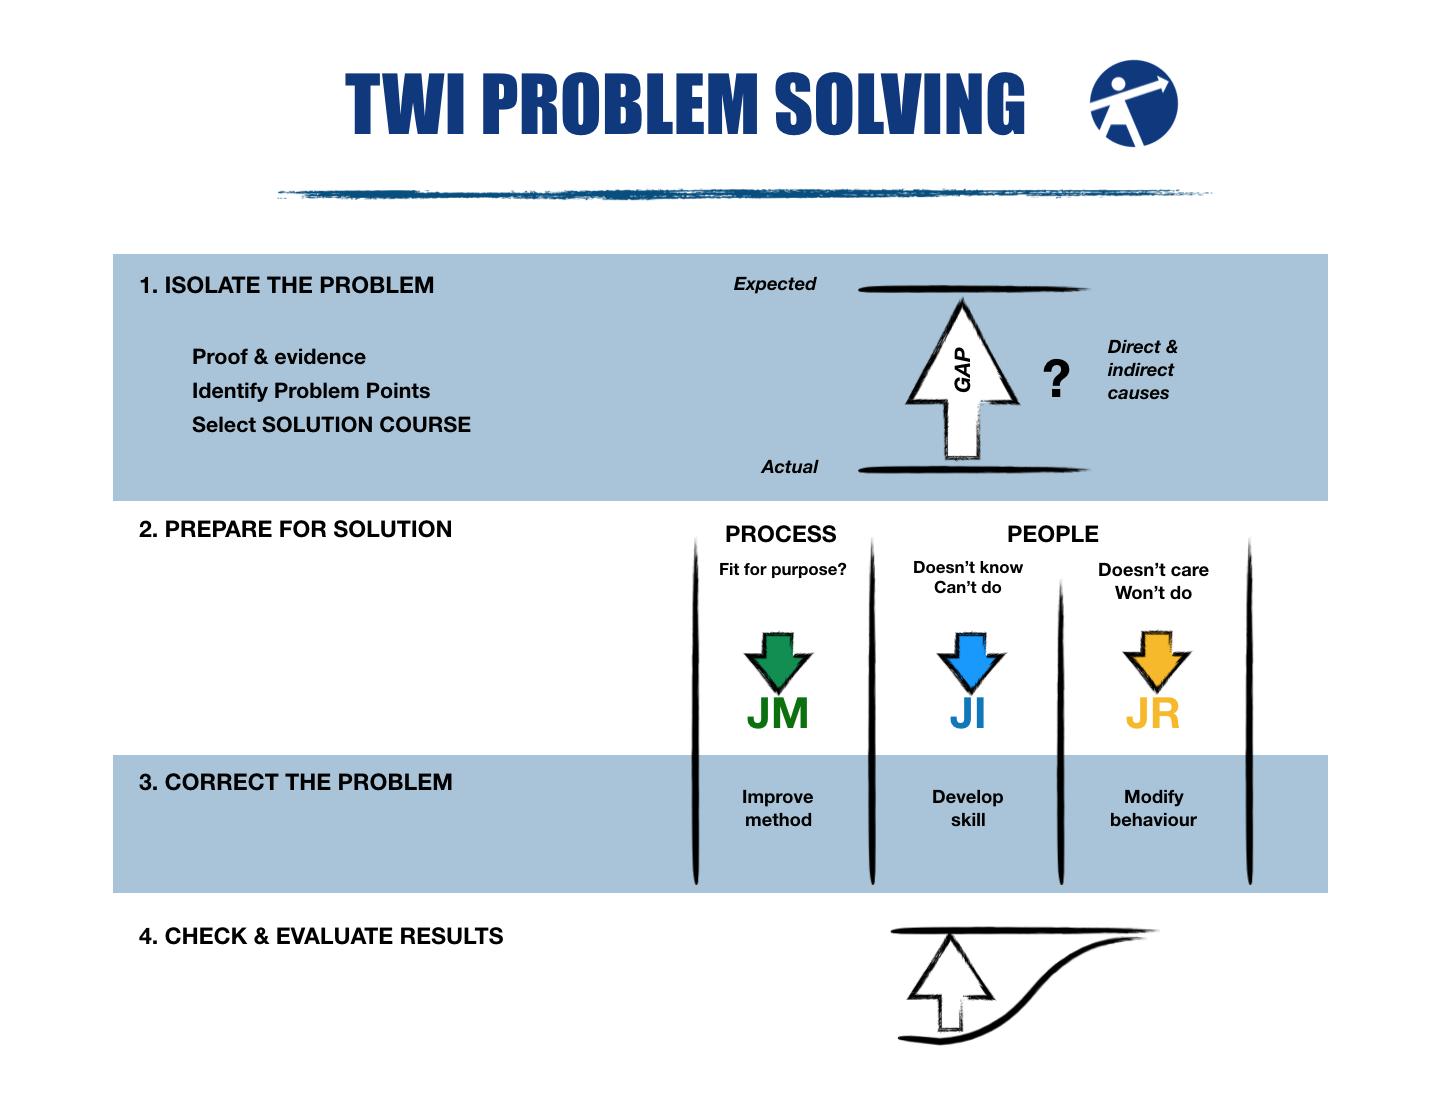 TWI Problem Solving.png